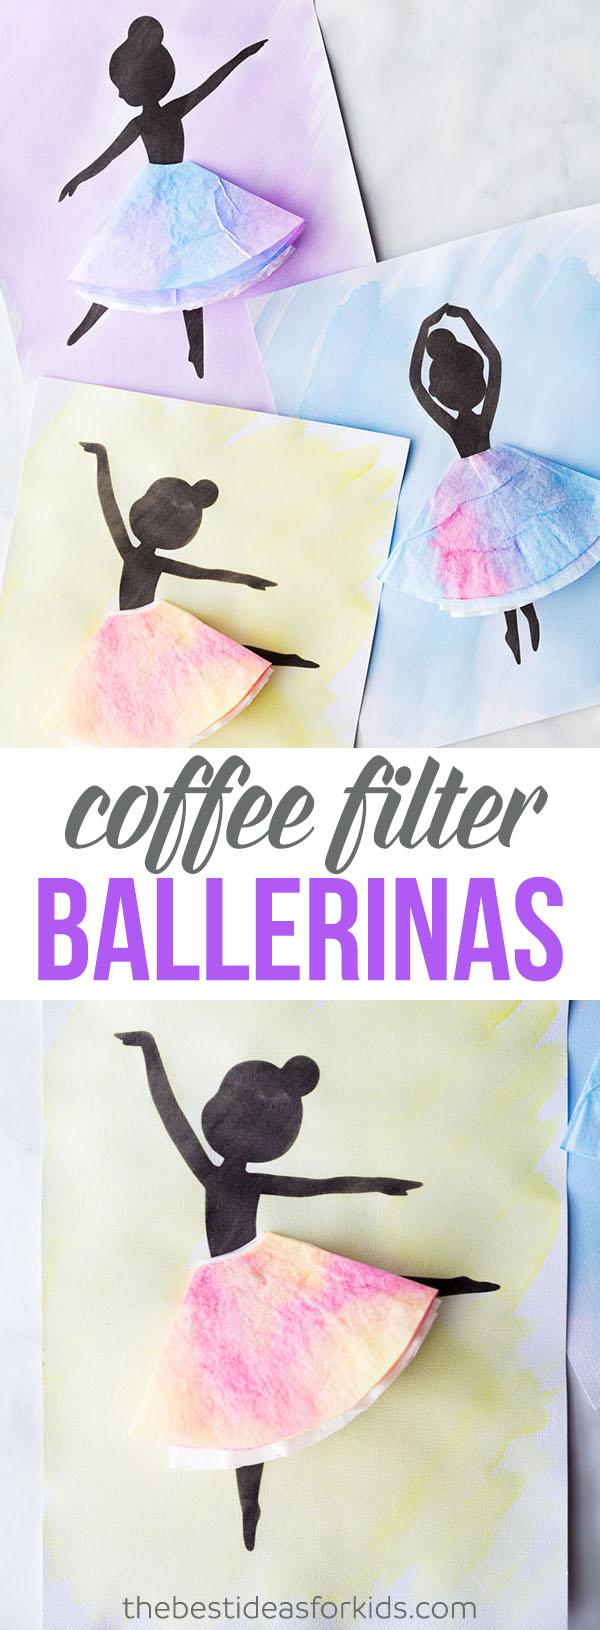 Coffee Filter Ballerina Silhouette Craft